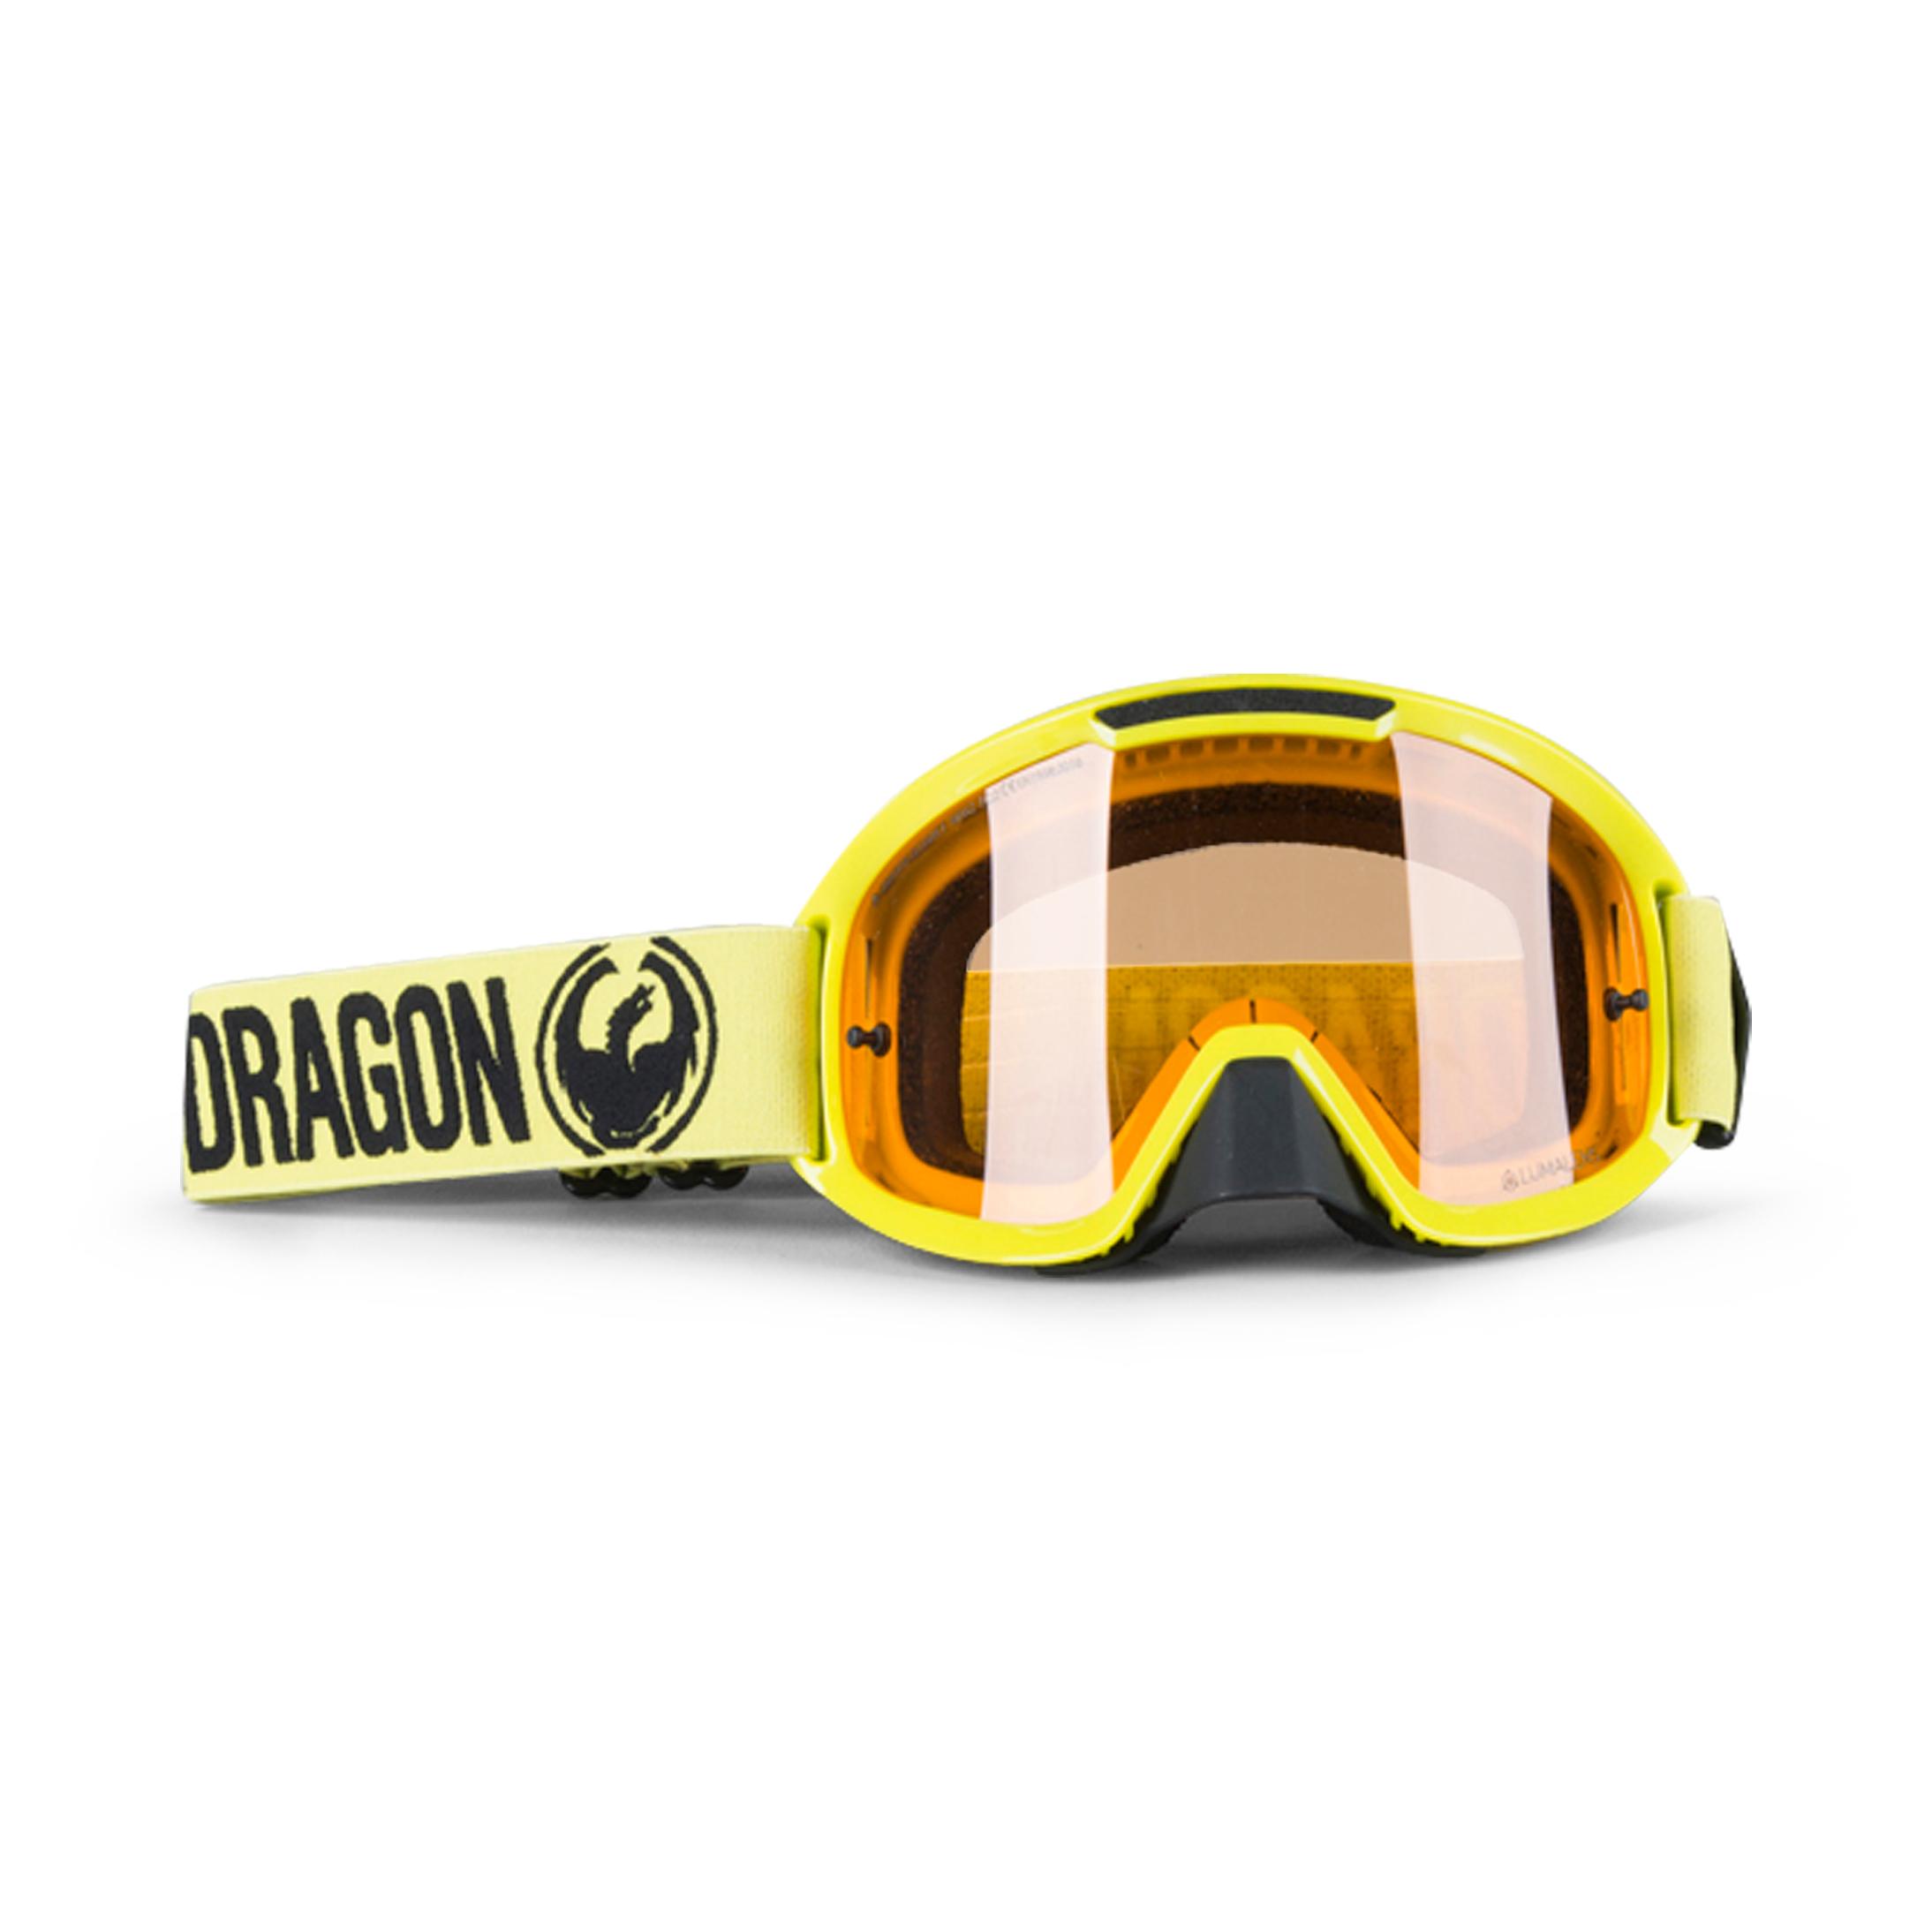 Dragon Masque Cross Dragon MDX2 Hydro Factory Jaune